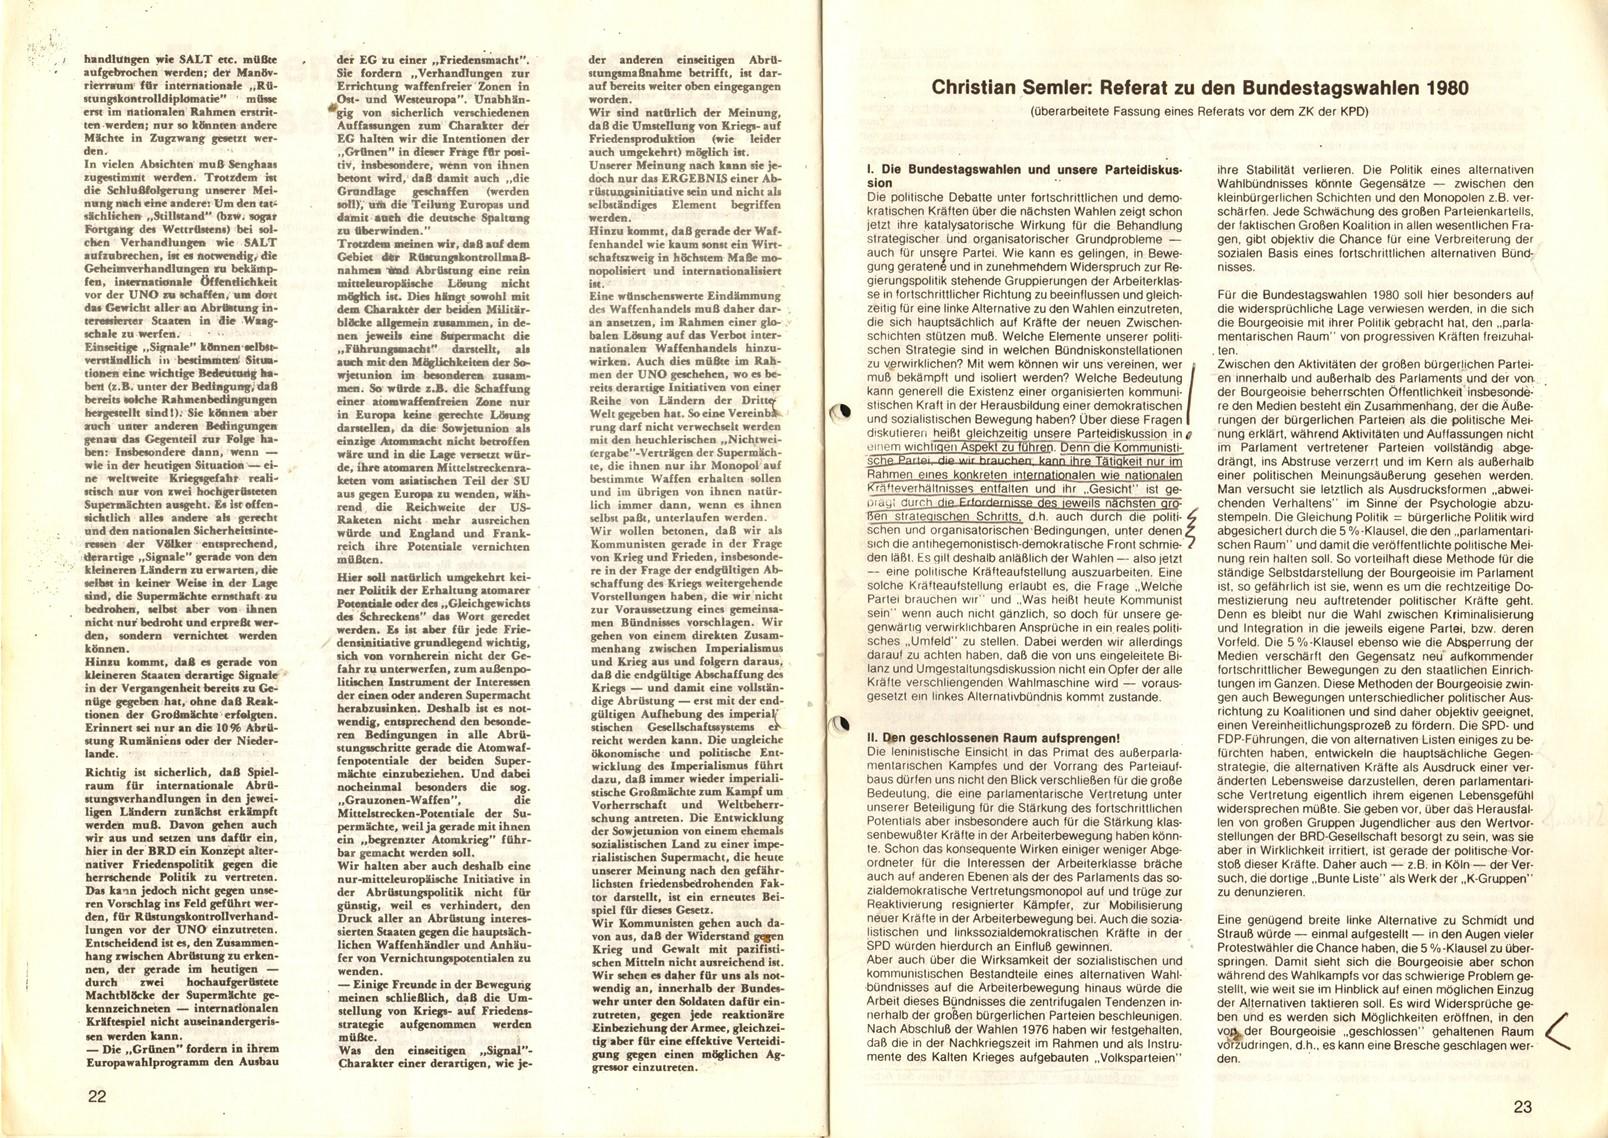 KPDAO_1979_Diskussion_Bundestagswahlen_1980_12